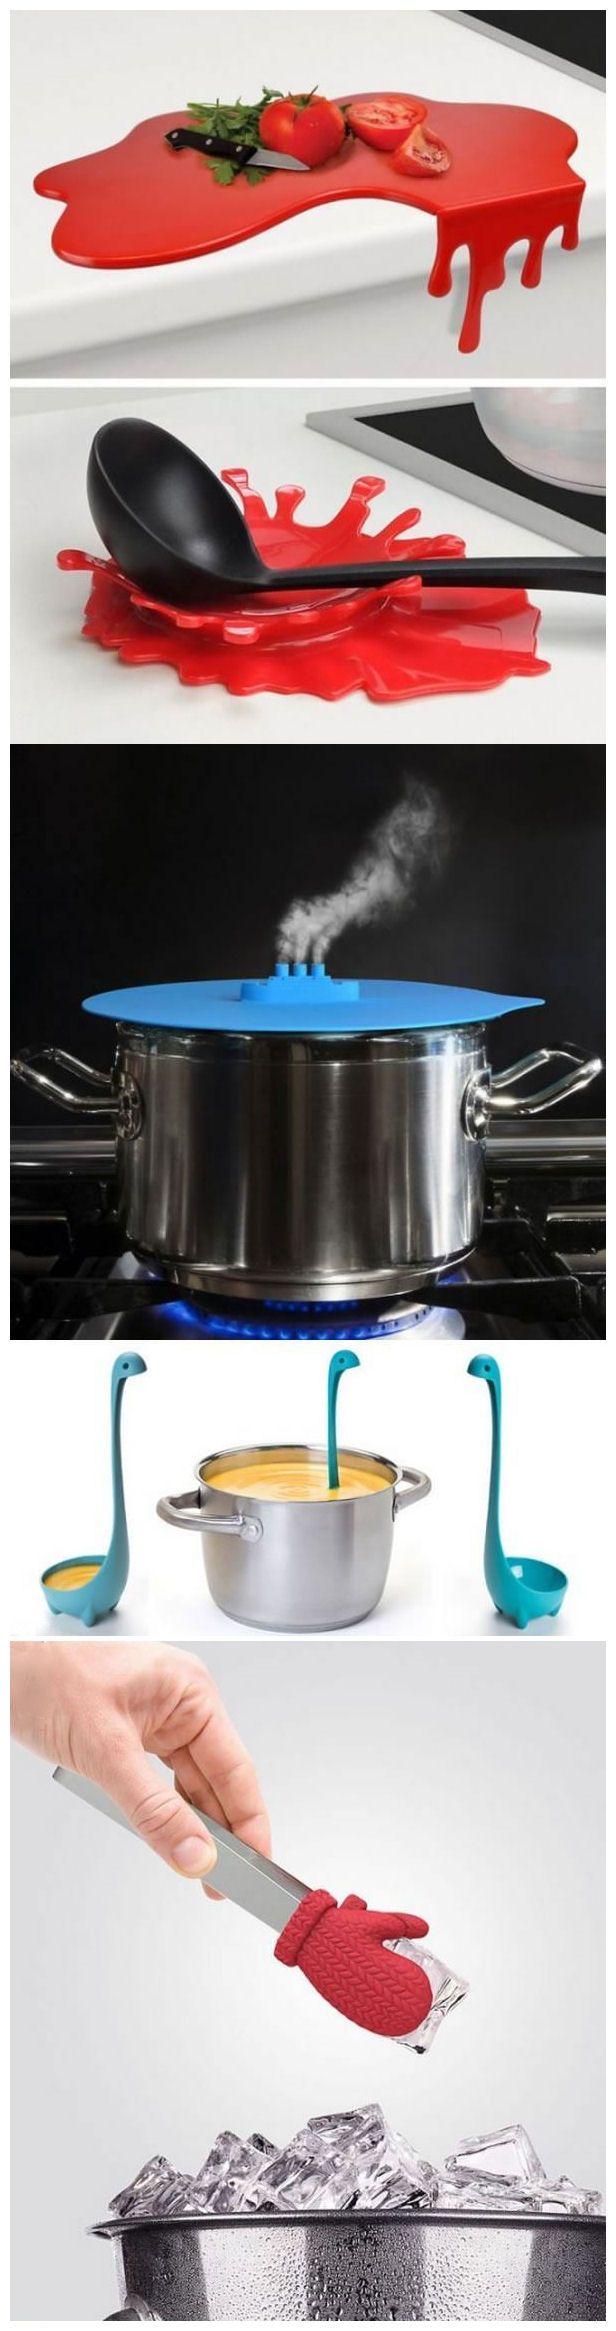 Best 25 Cooking gadgets ideas on Pinterest Kitchen gadgets